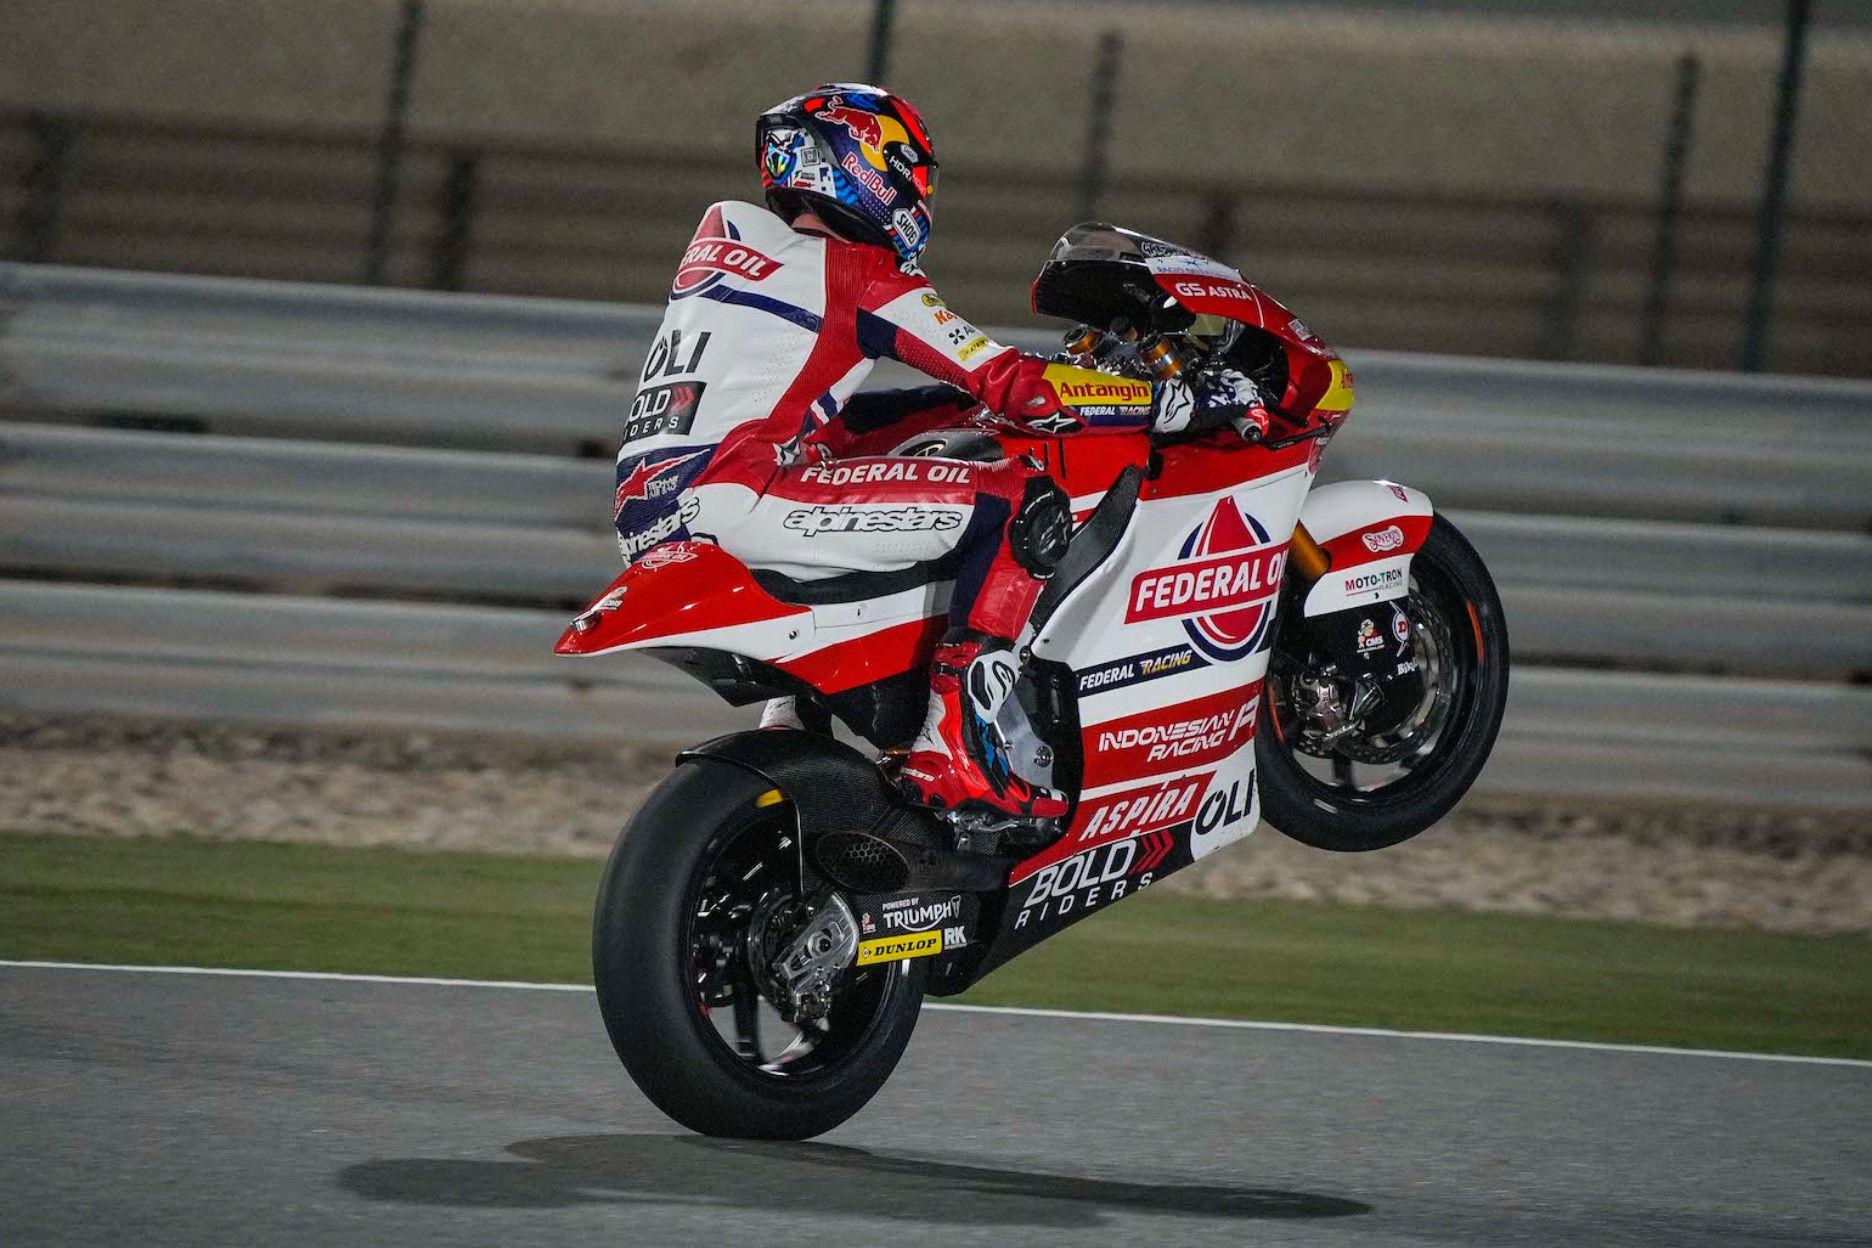 Fabio Di Giannantonio (21). Photo courtesy Federal Oil Gresini Racing.